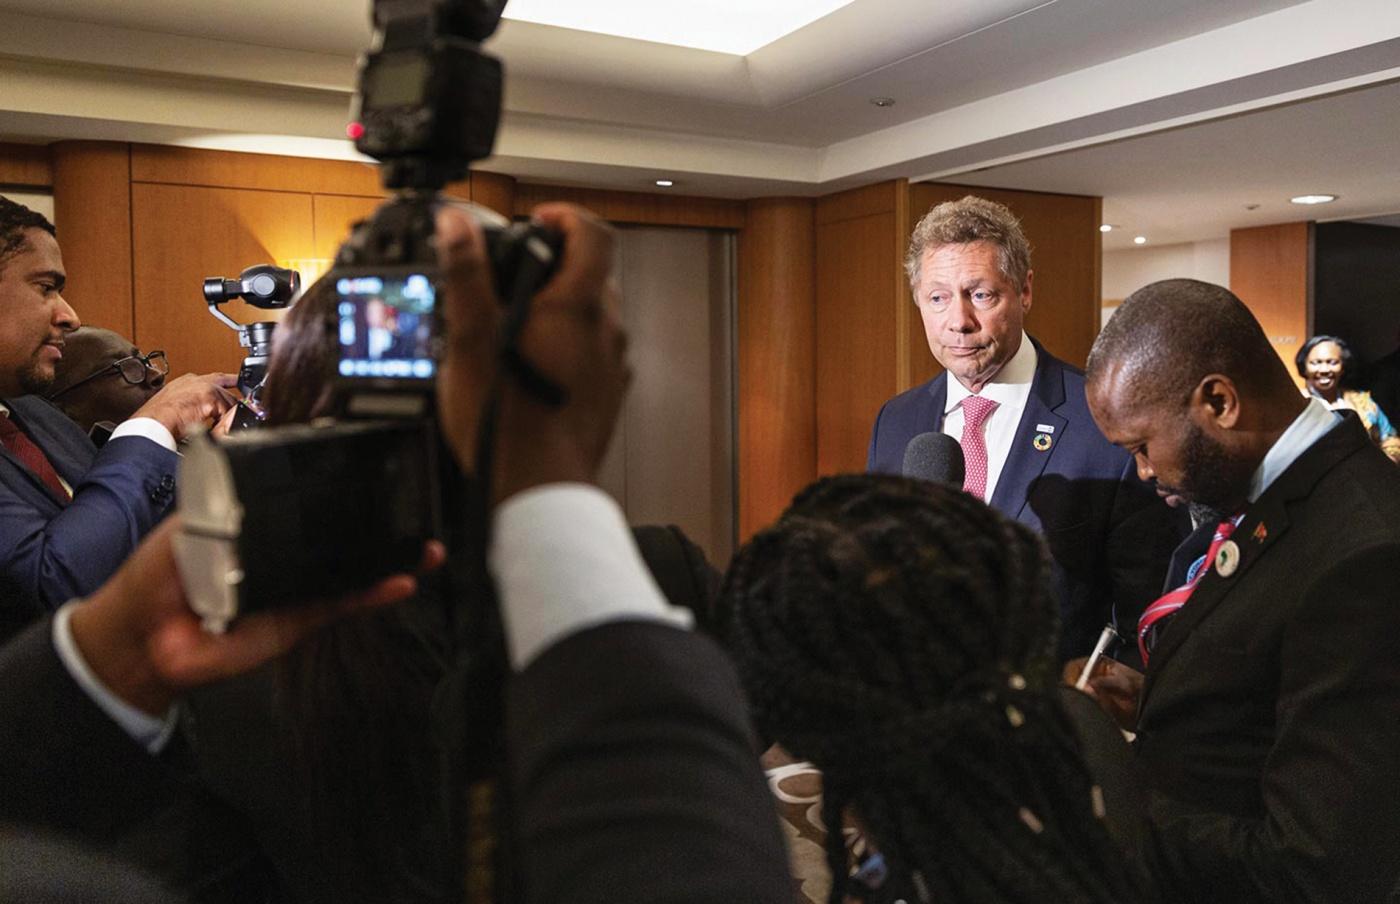 Berkley meets with press